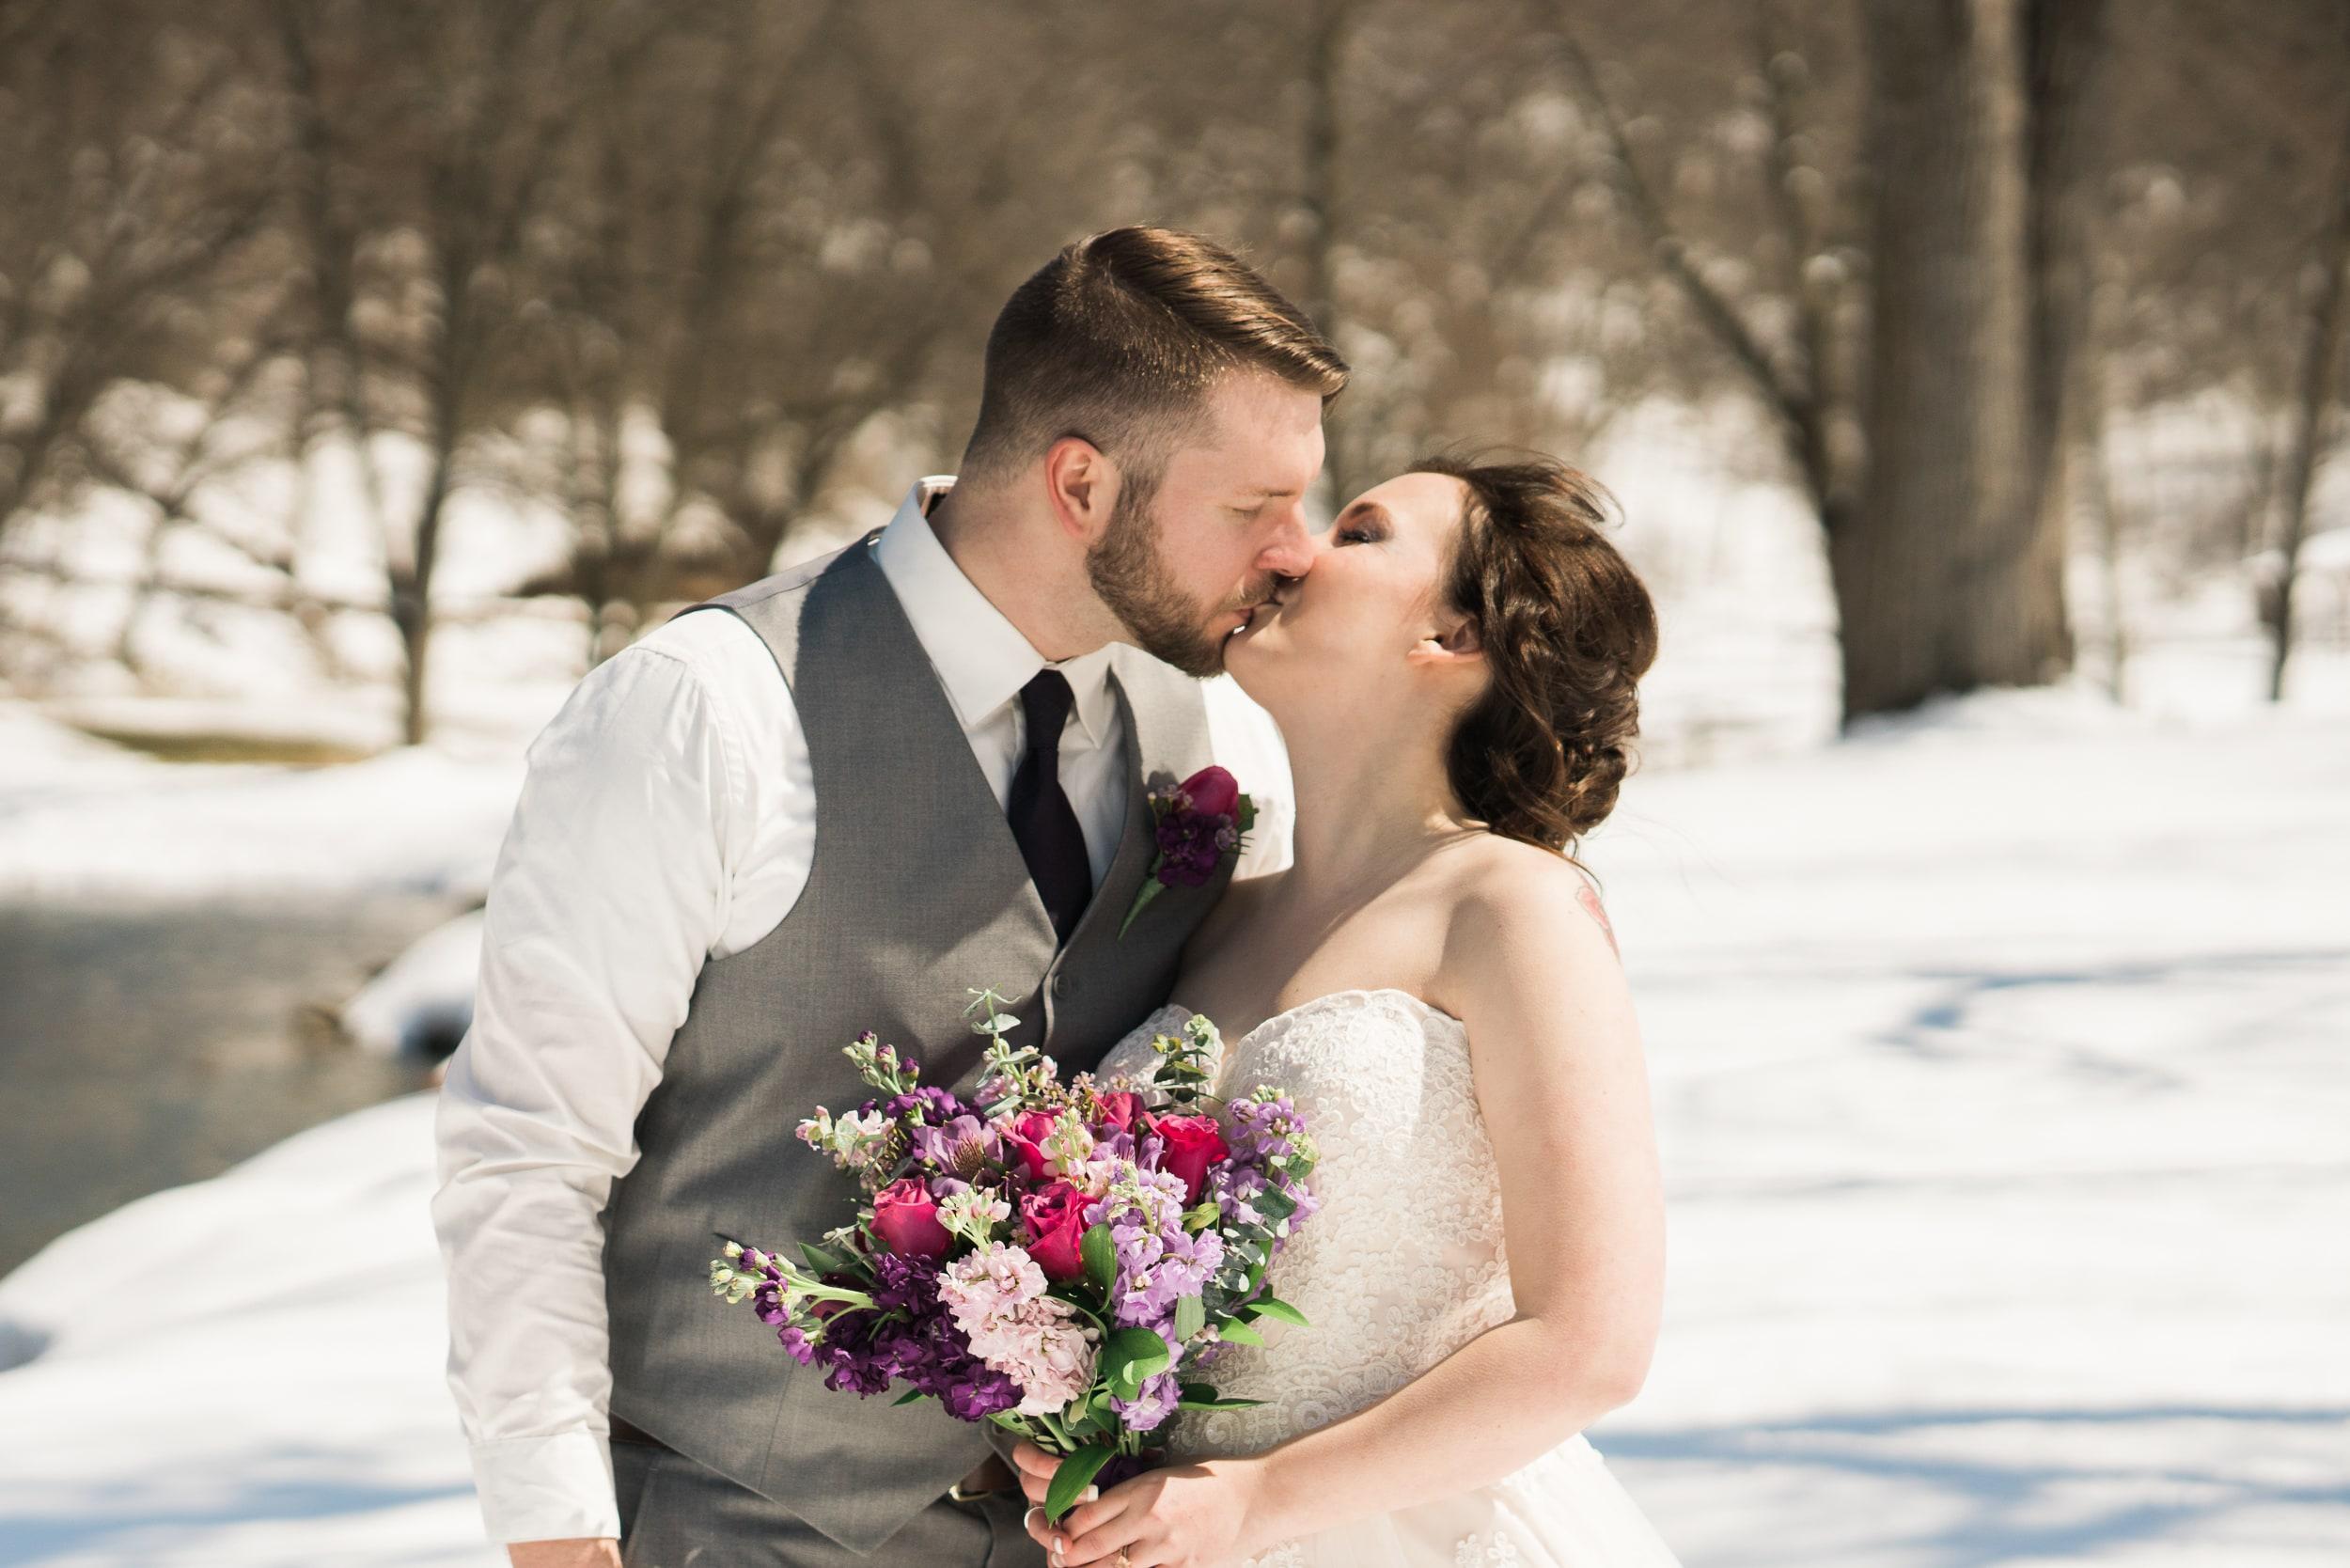 snowy-intimate-wedding-21.jpg